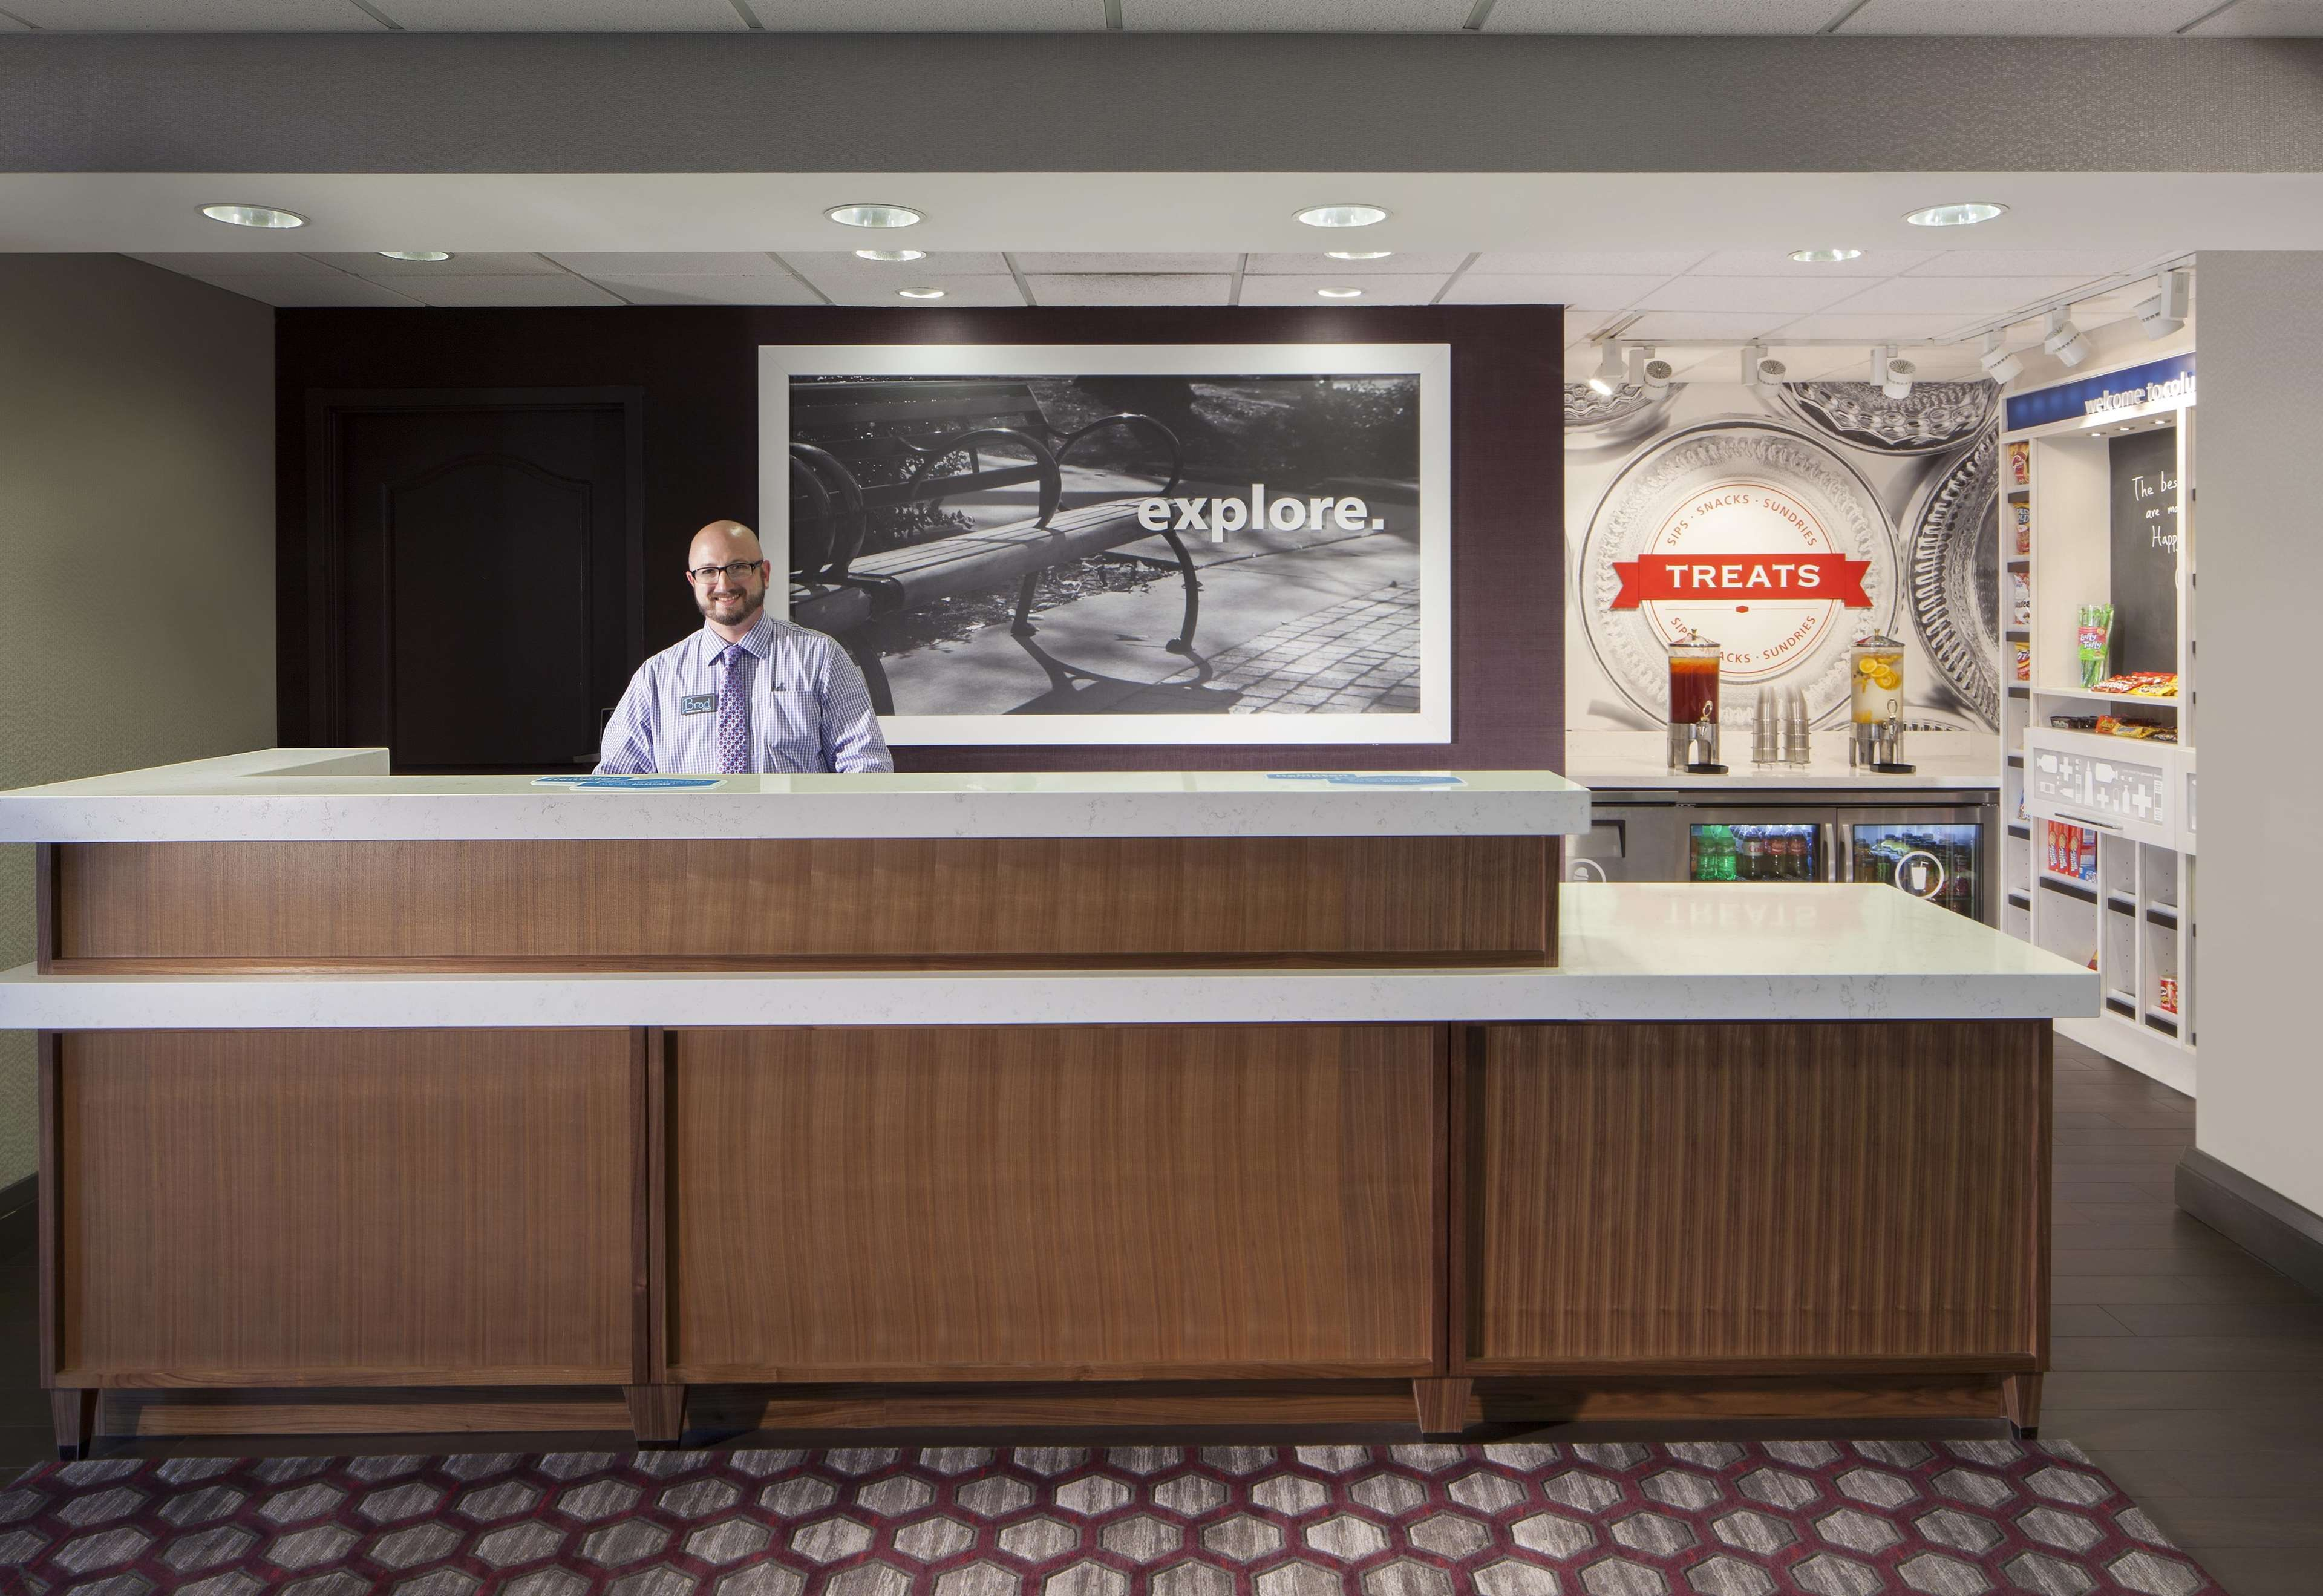 Hampton Inn & Suites Columbus-Easton Area image 6